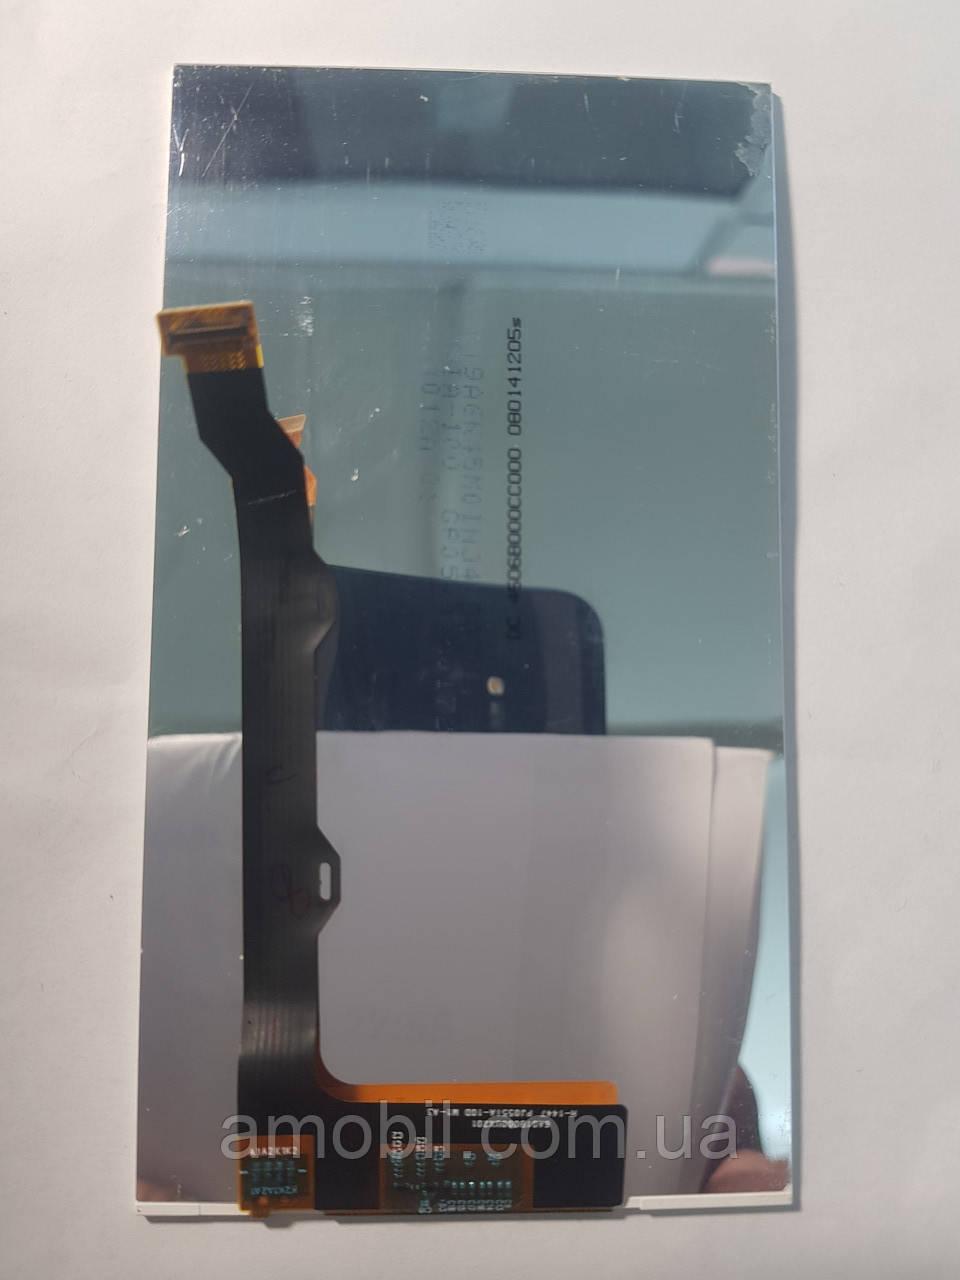 Дисплей Lenovo S8 A7600 orig